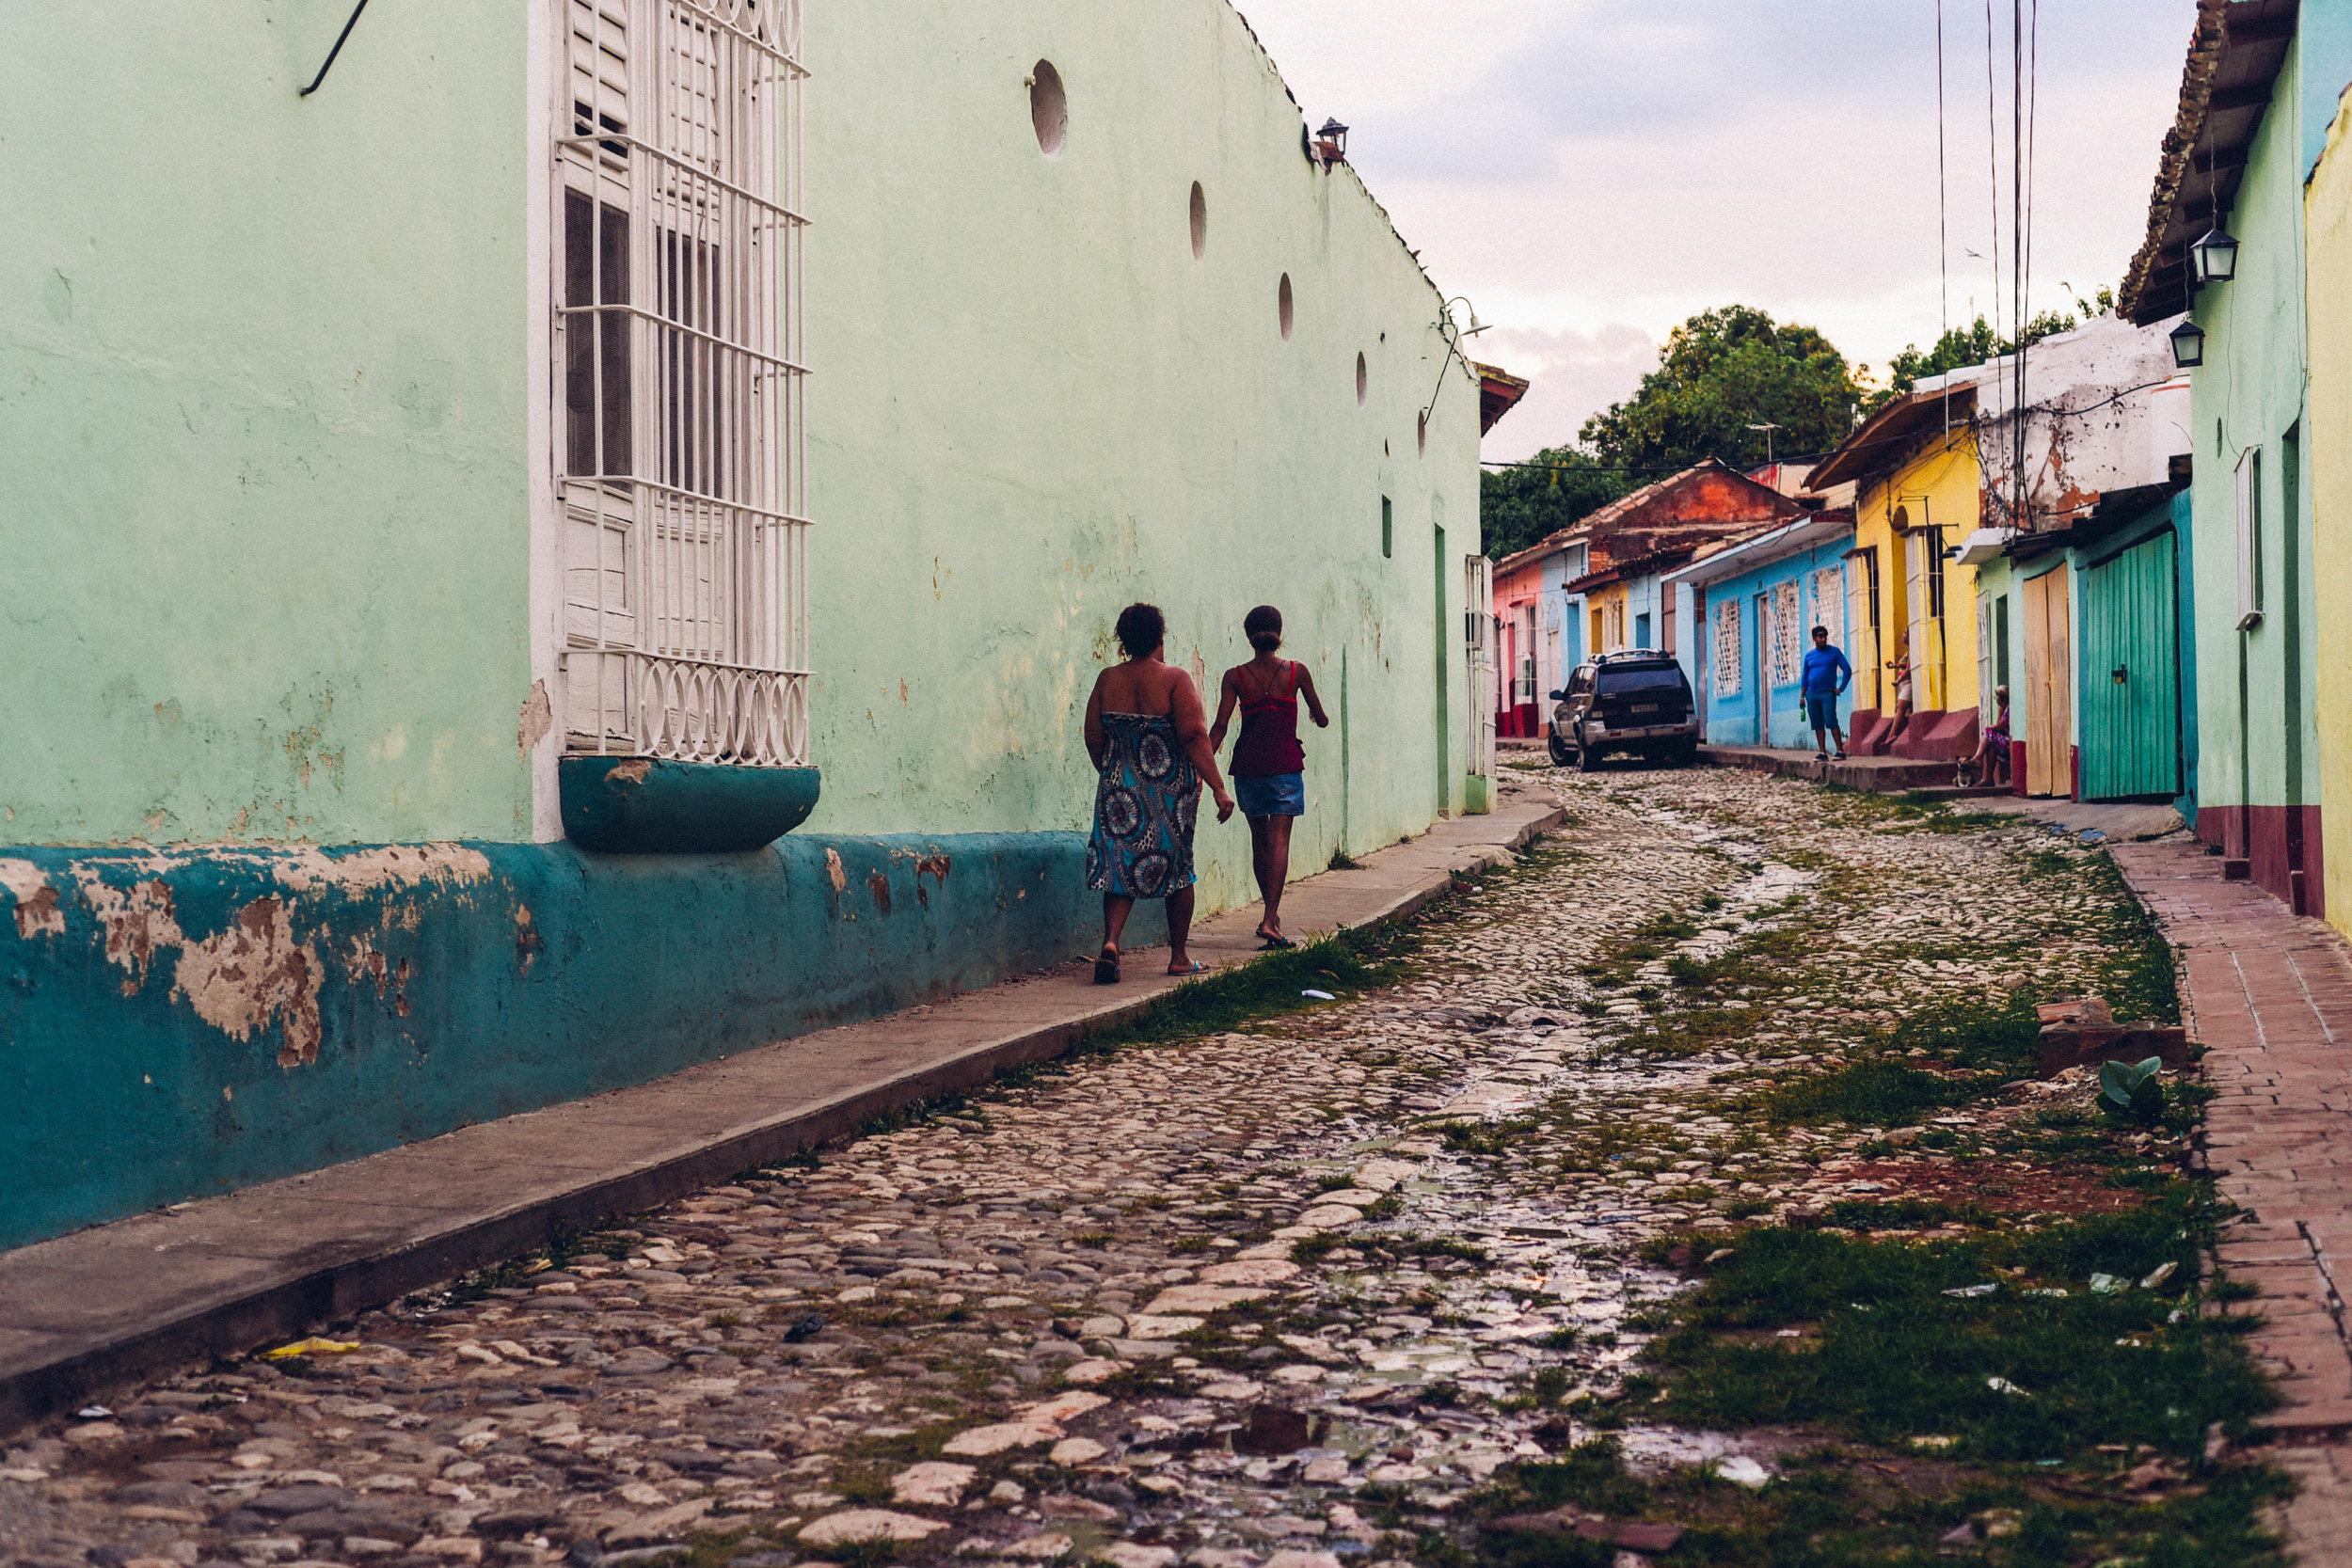 Cuba_Trinidad-15.jpg